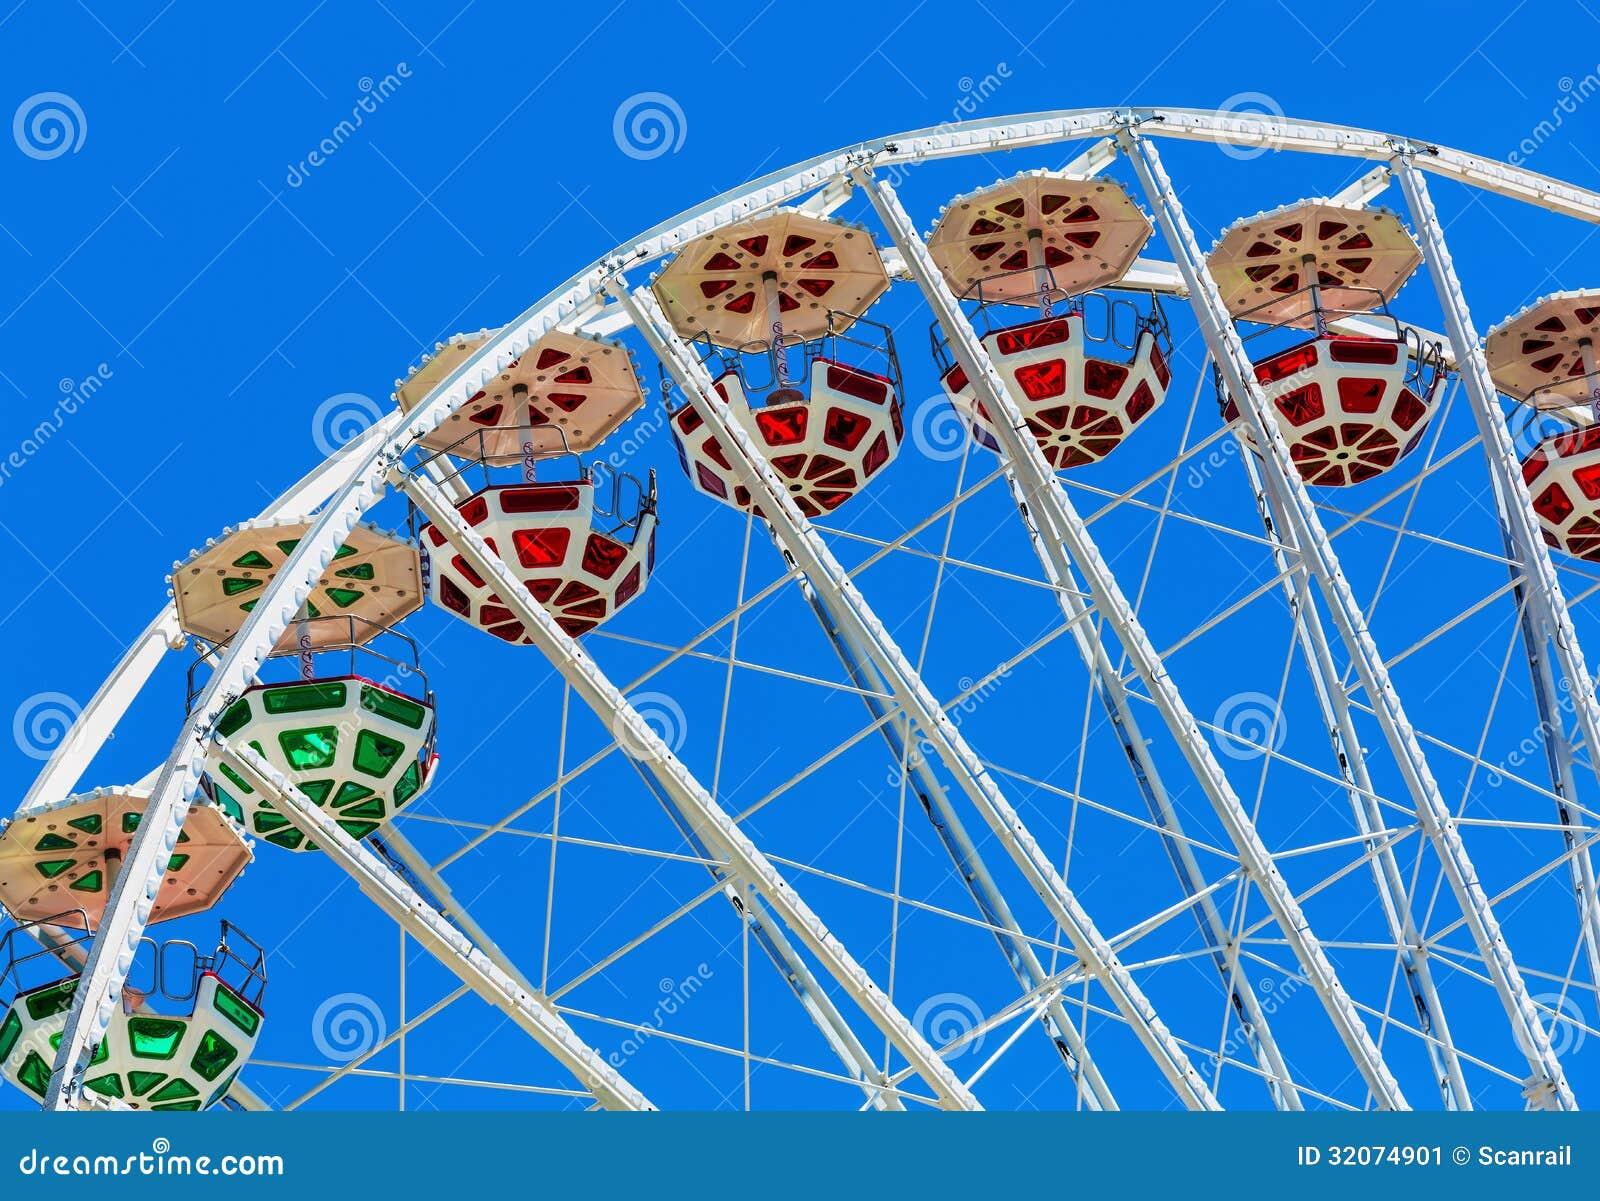 Ferris Wheel Stock Image - Image: 32074901